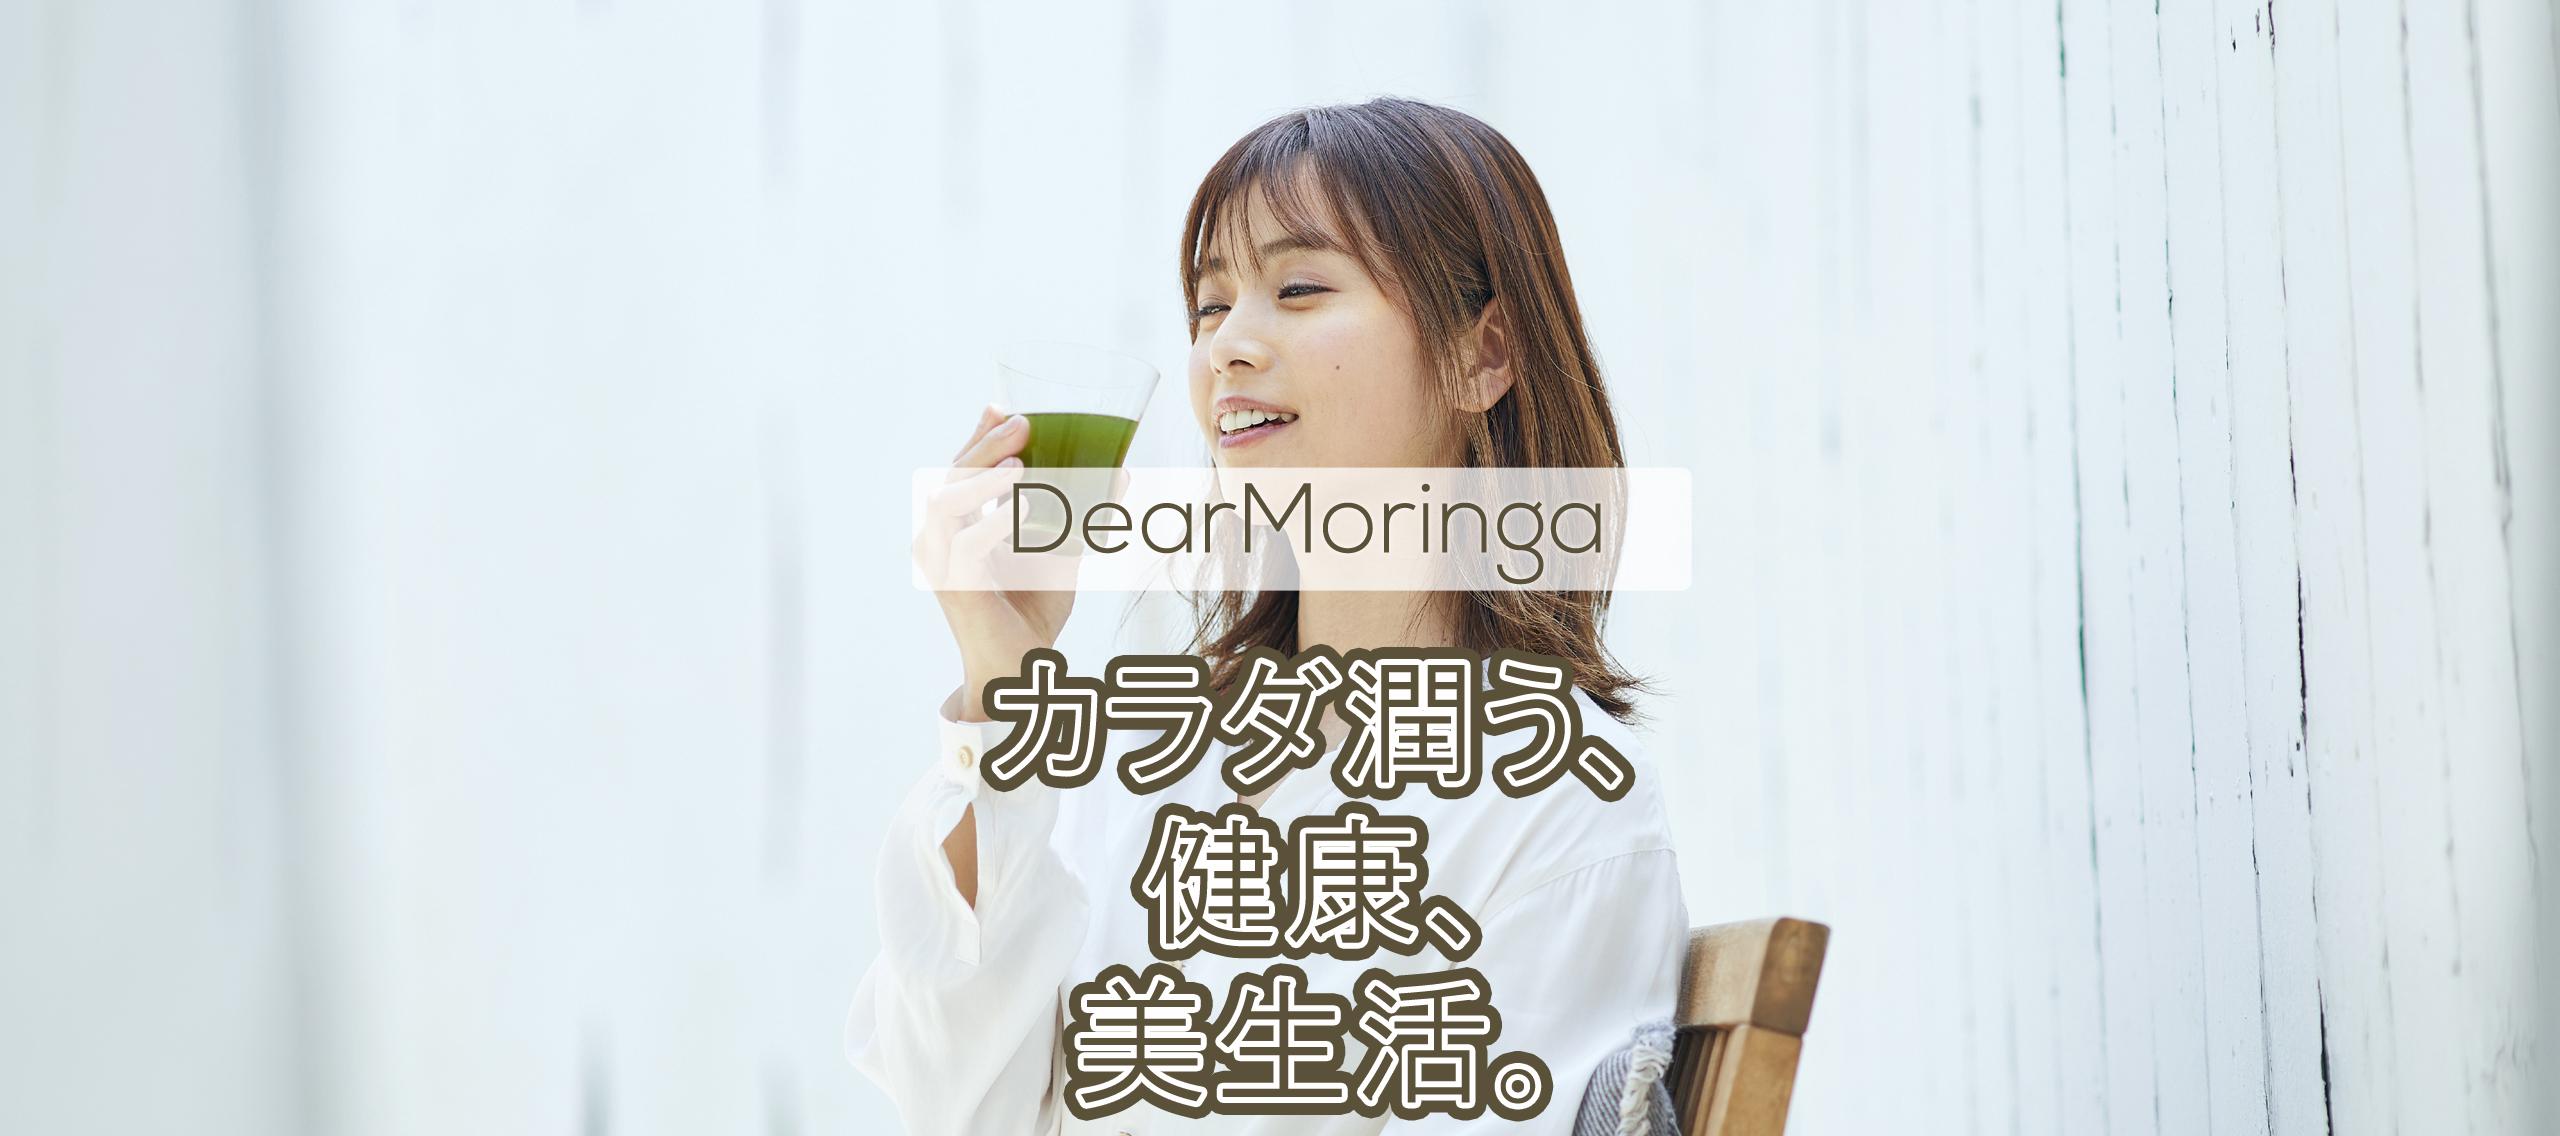 DearMoringa カラダ潤う、健康、美生活。